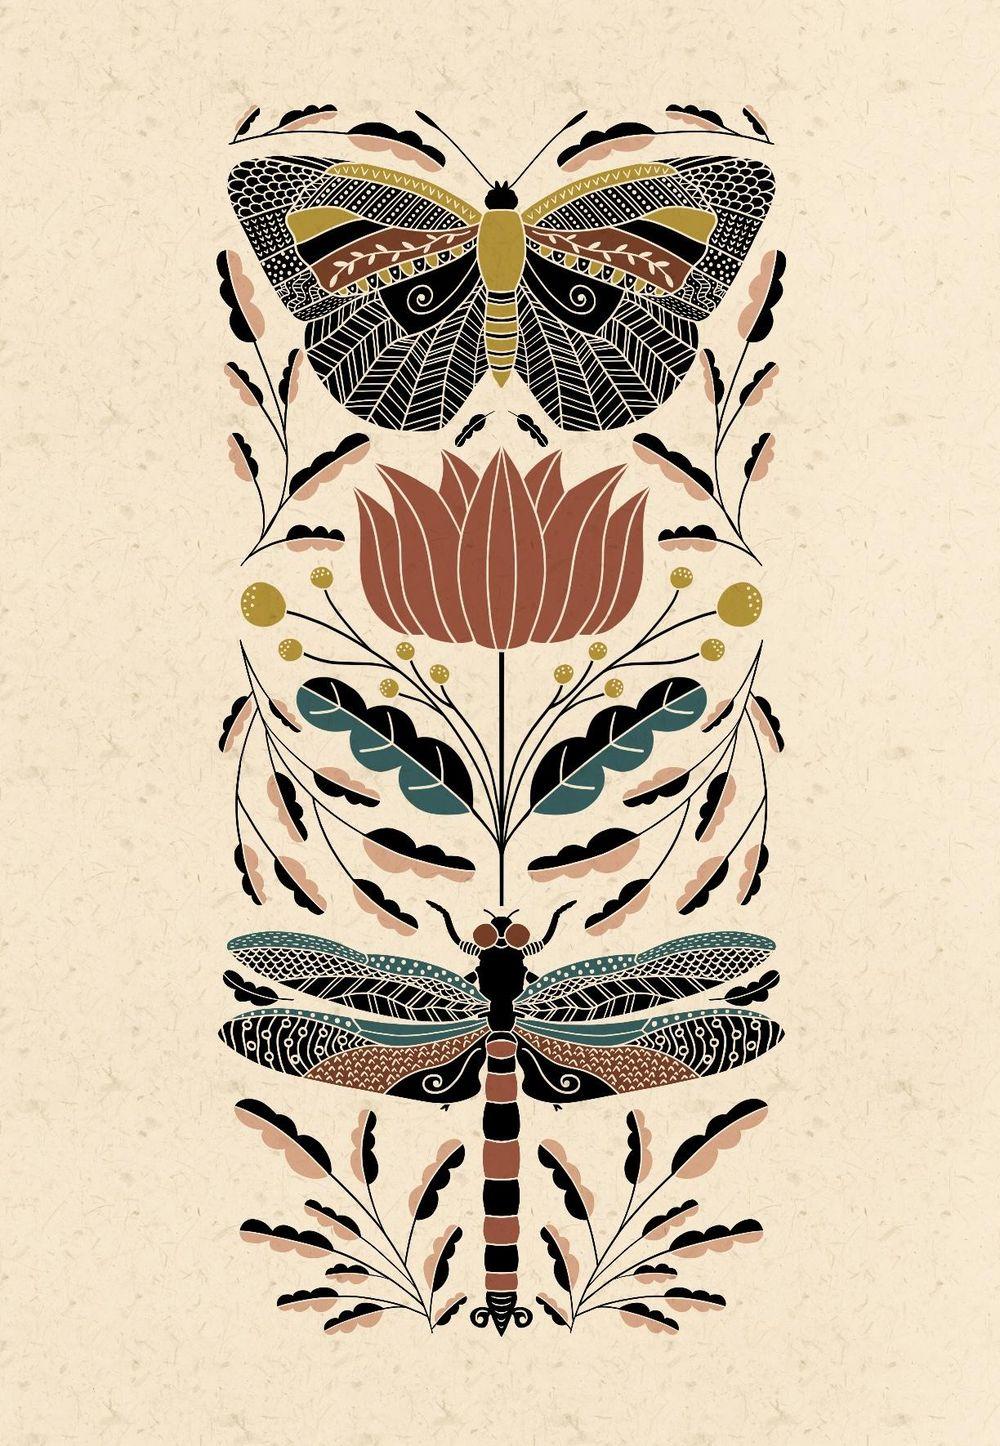 Folk Art Illustrations - image 3 - student project